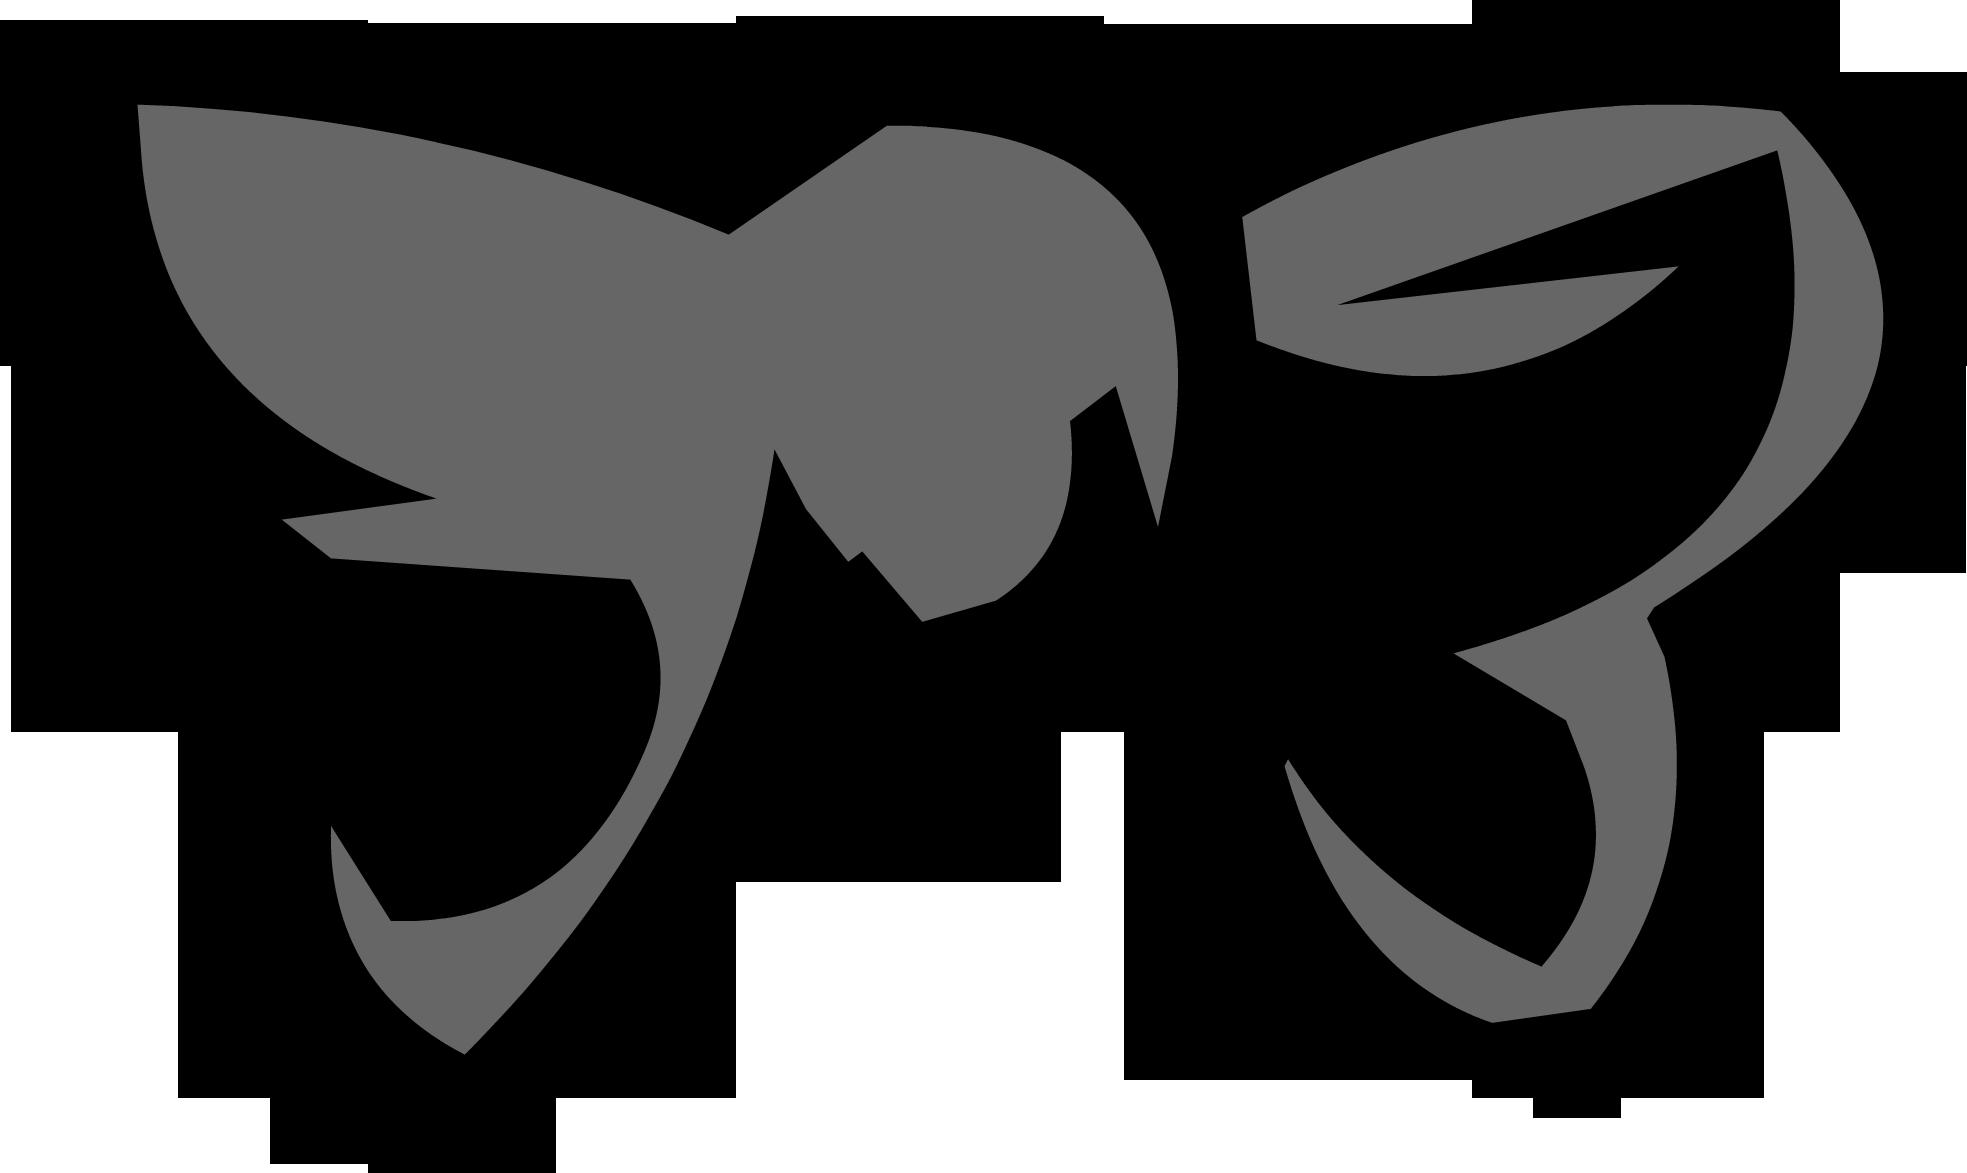 White clipart bowtie. Black club penguin rewritten